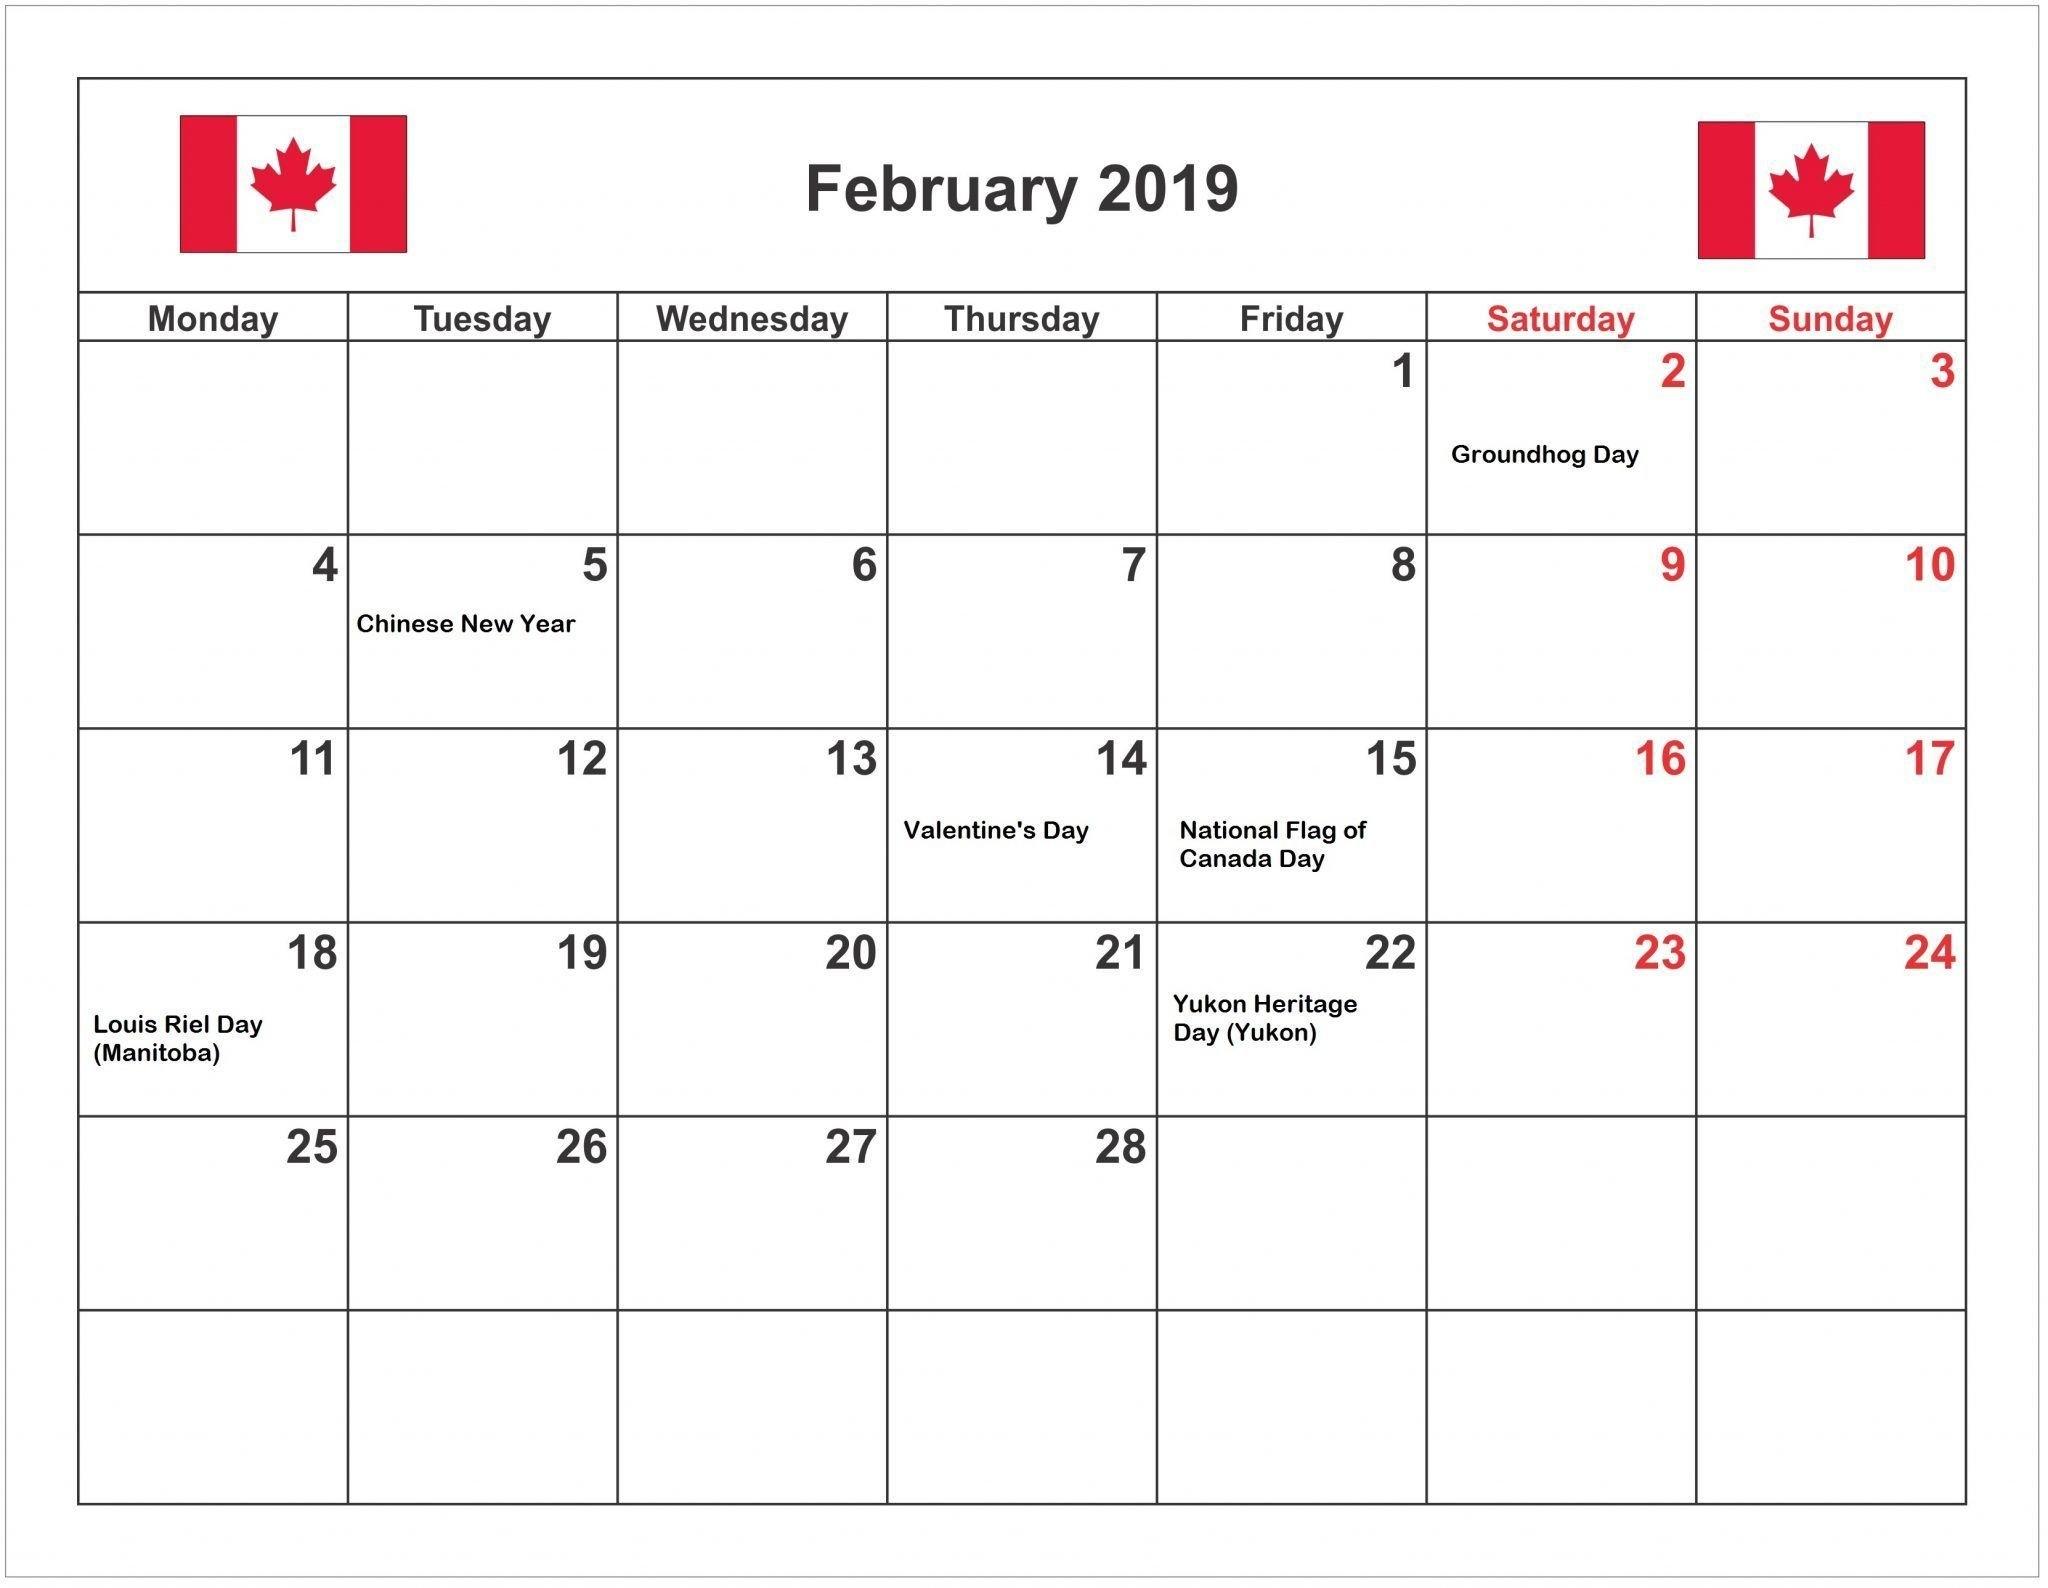 February 2019 Calendar Canada With Holidays | February 2019 Calendar Calendar 2019 Canada Holidays